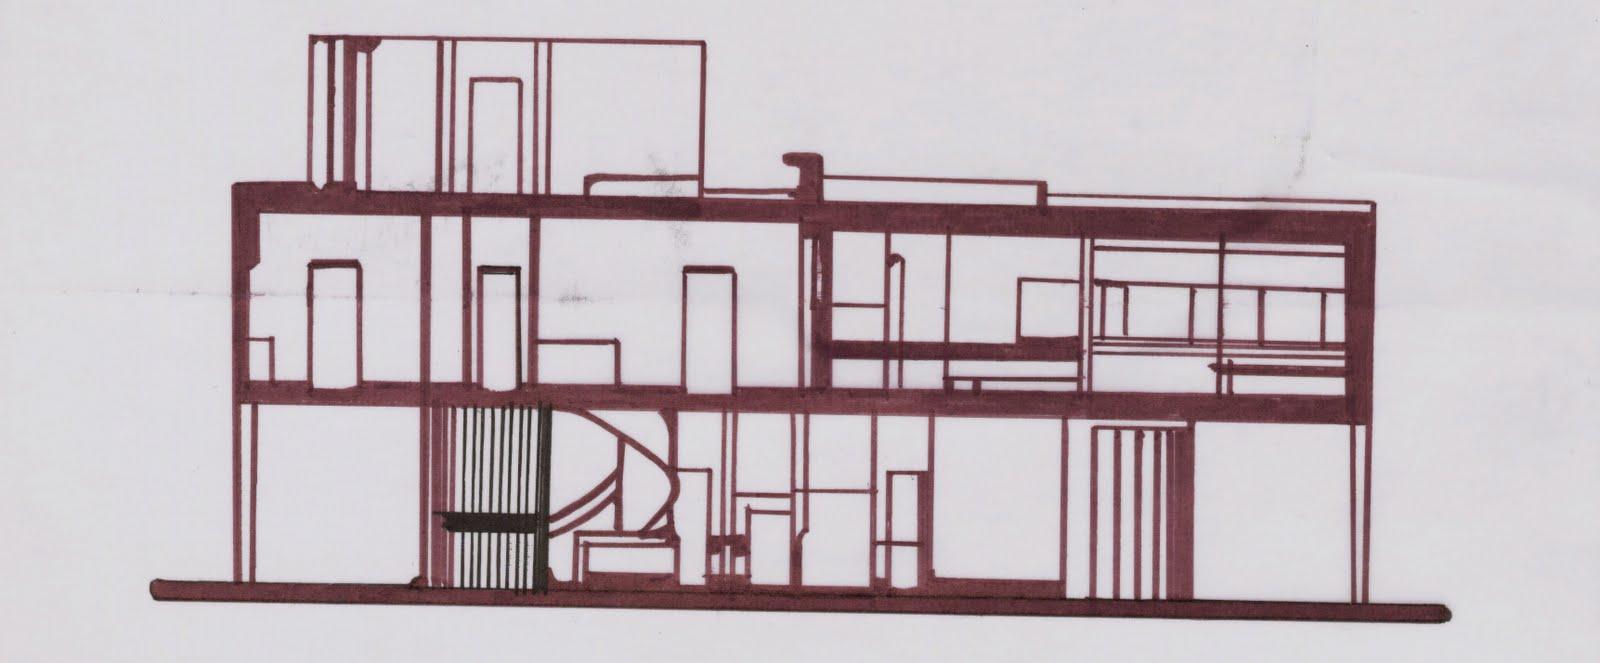 Villa Savoye Section Cut Section b  poche  section cVilla Savoye Section